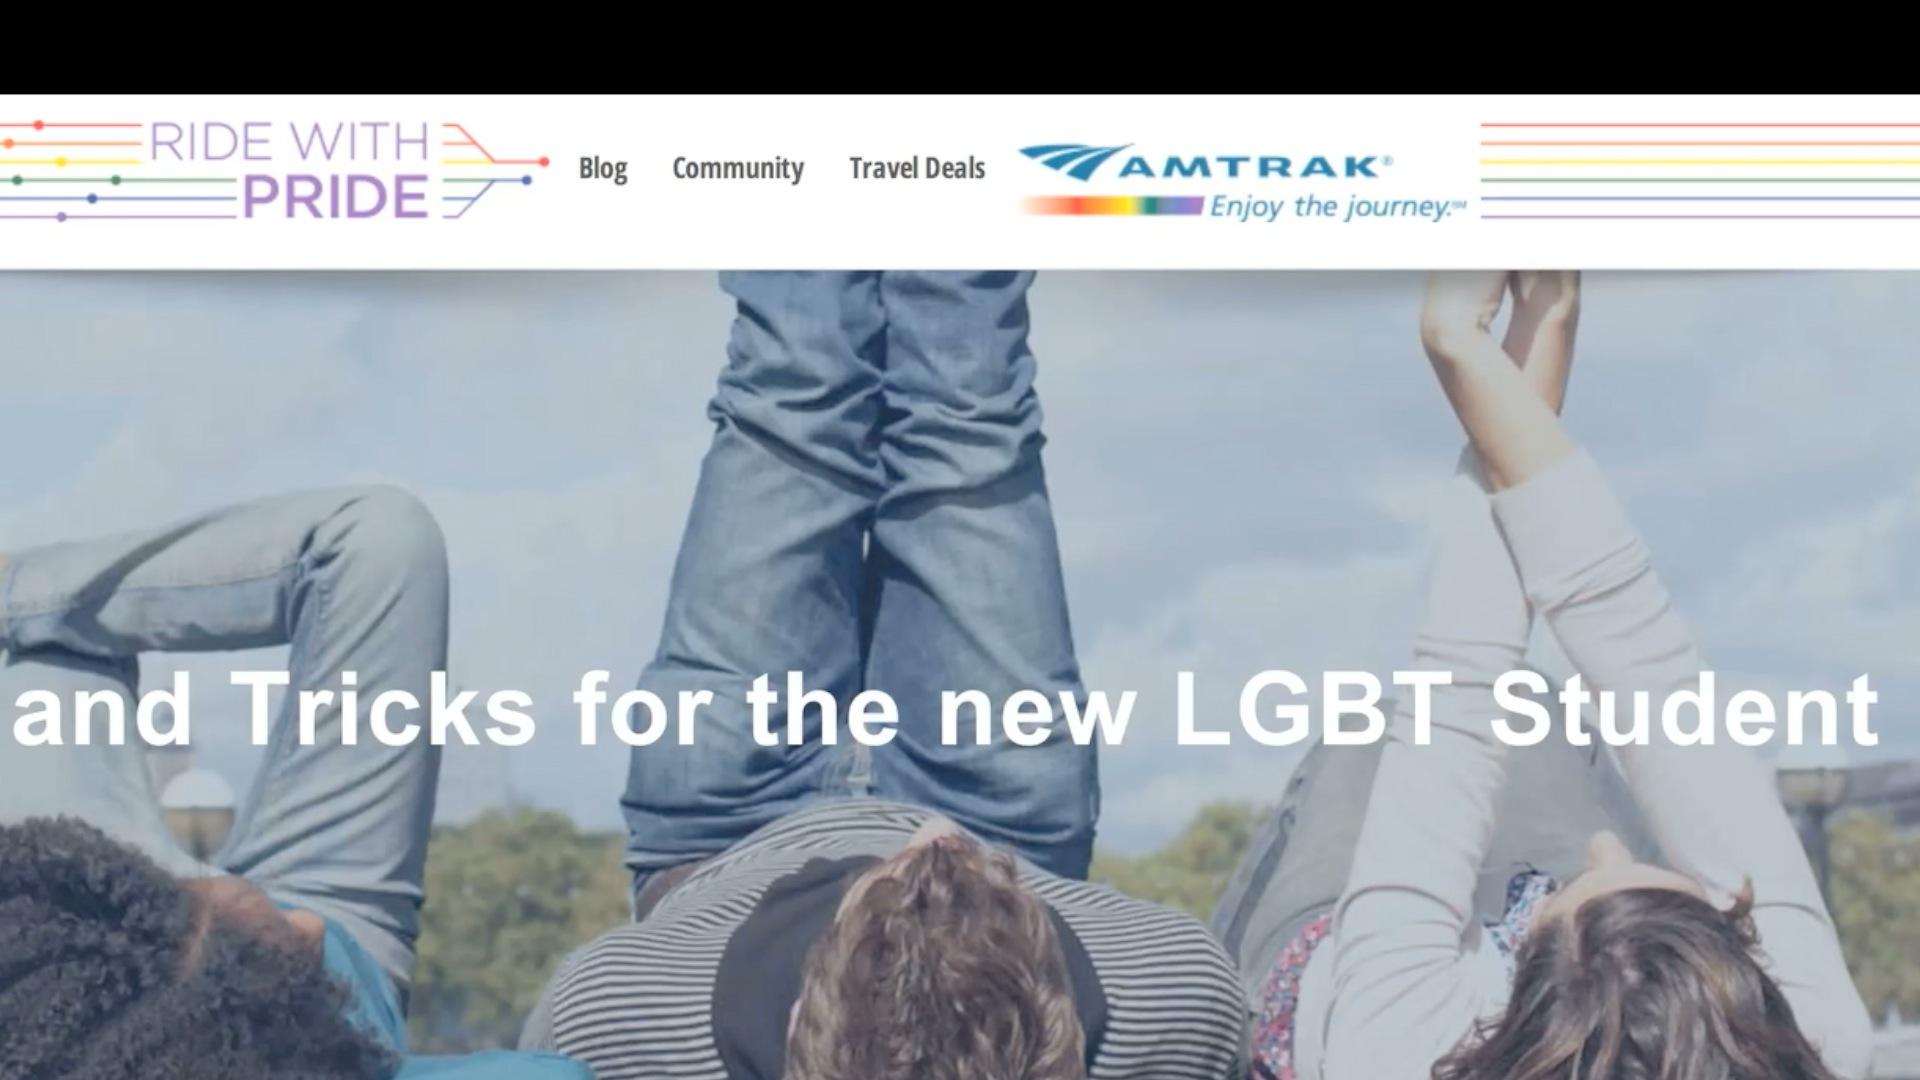 Amtrak homo kytkennät